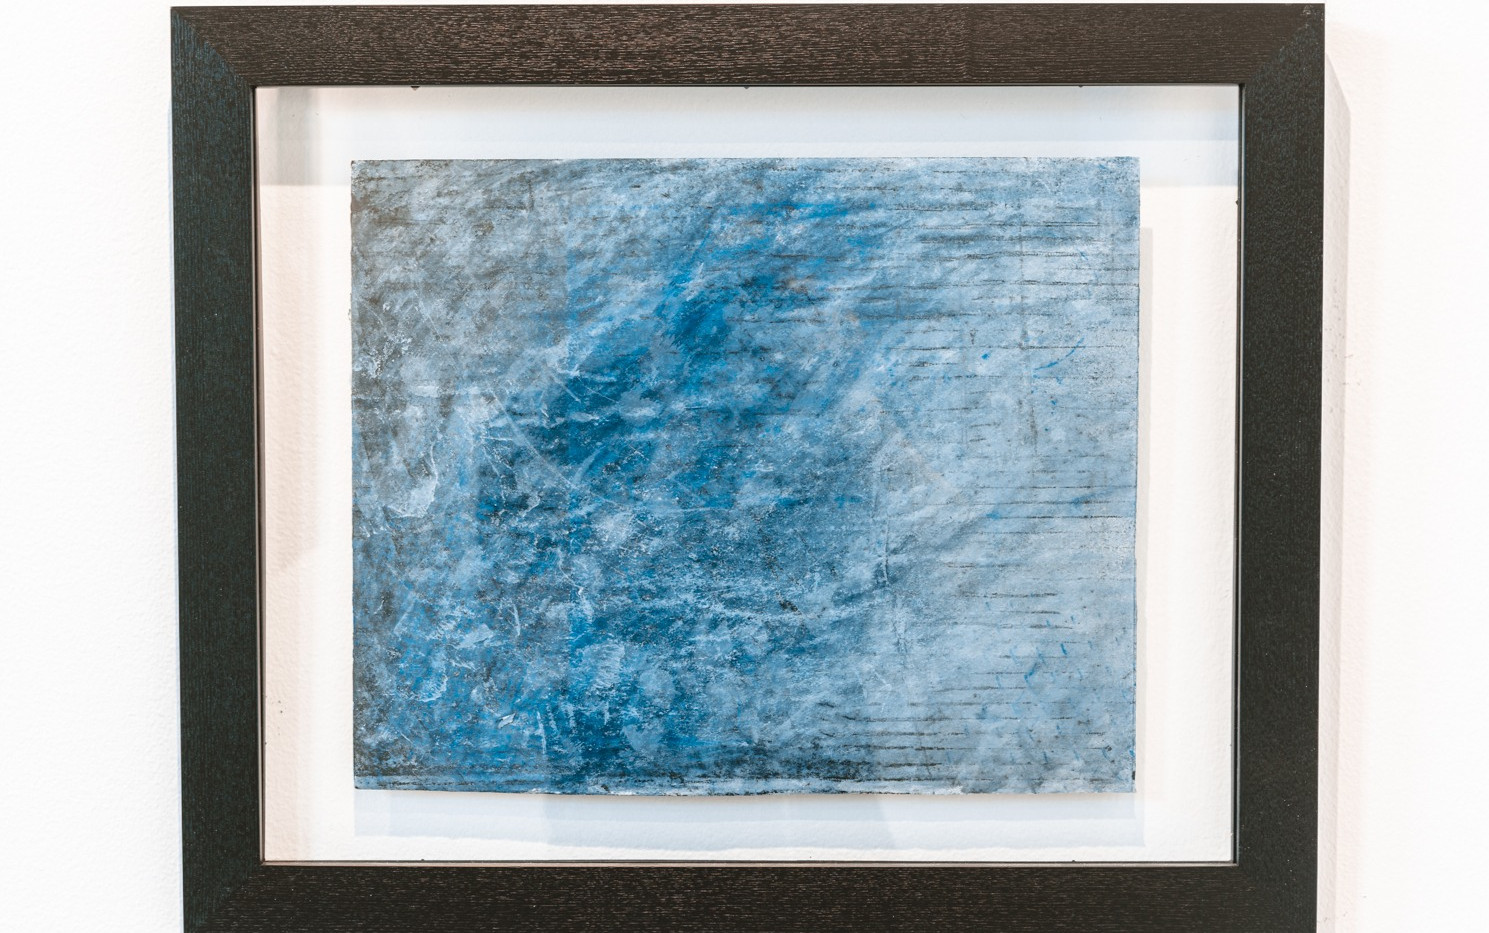 "IRA TATTELMAN  ""Vardar River Drift 2019"" Monoprint on Fabriano Tiepolo paper 18.75"" x 22.75"" framed 2019 $425  Photograph by StereoVision"